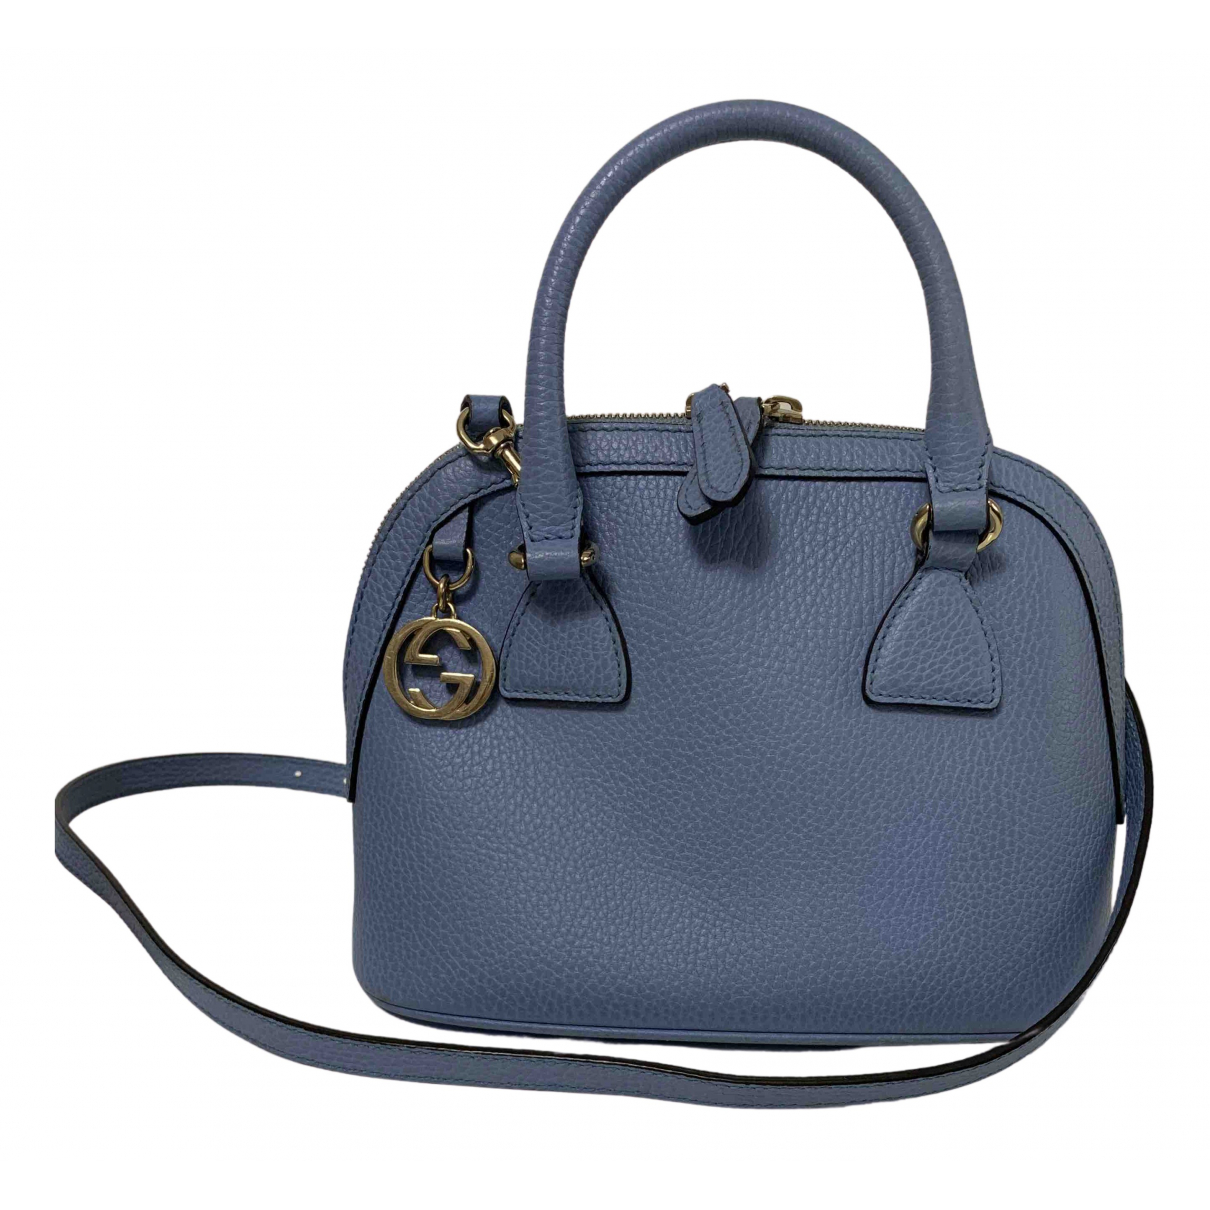 Gucci - Sac a main   pour femme en cuir - bleu